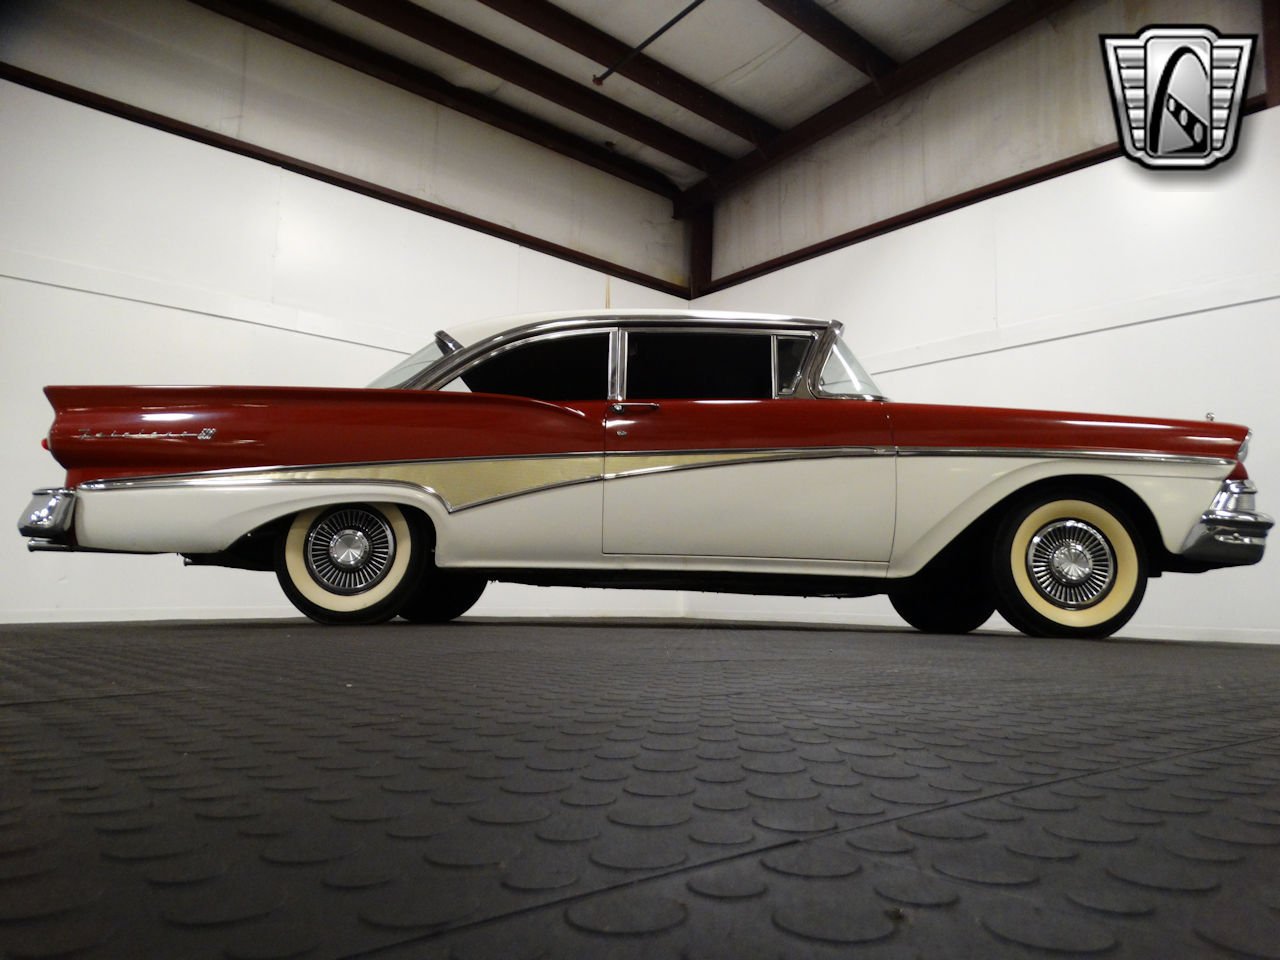 1958 Ford Fairlane 38